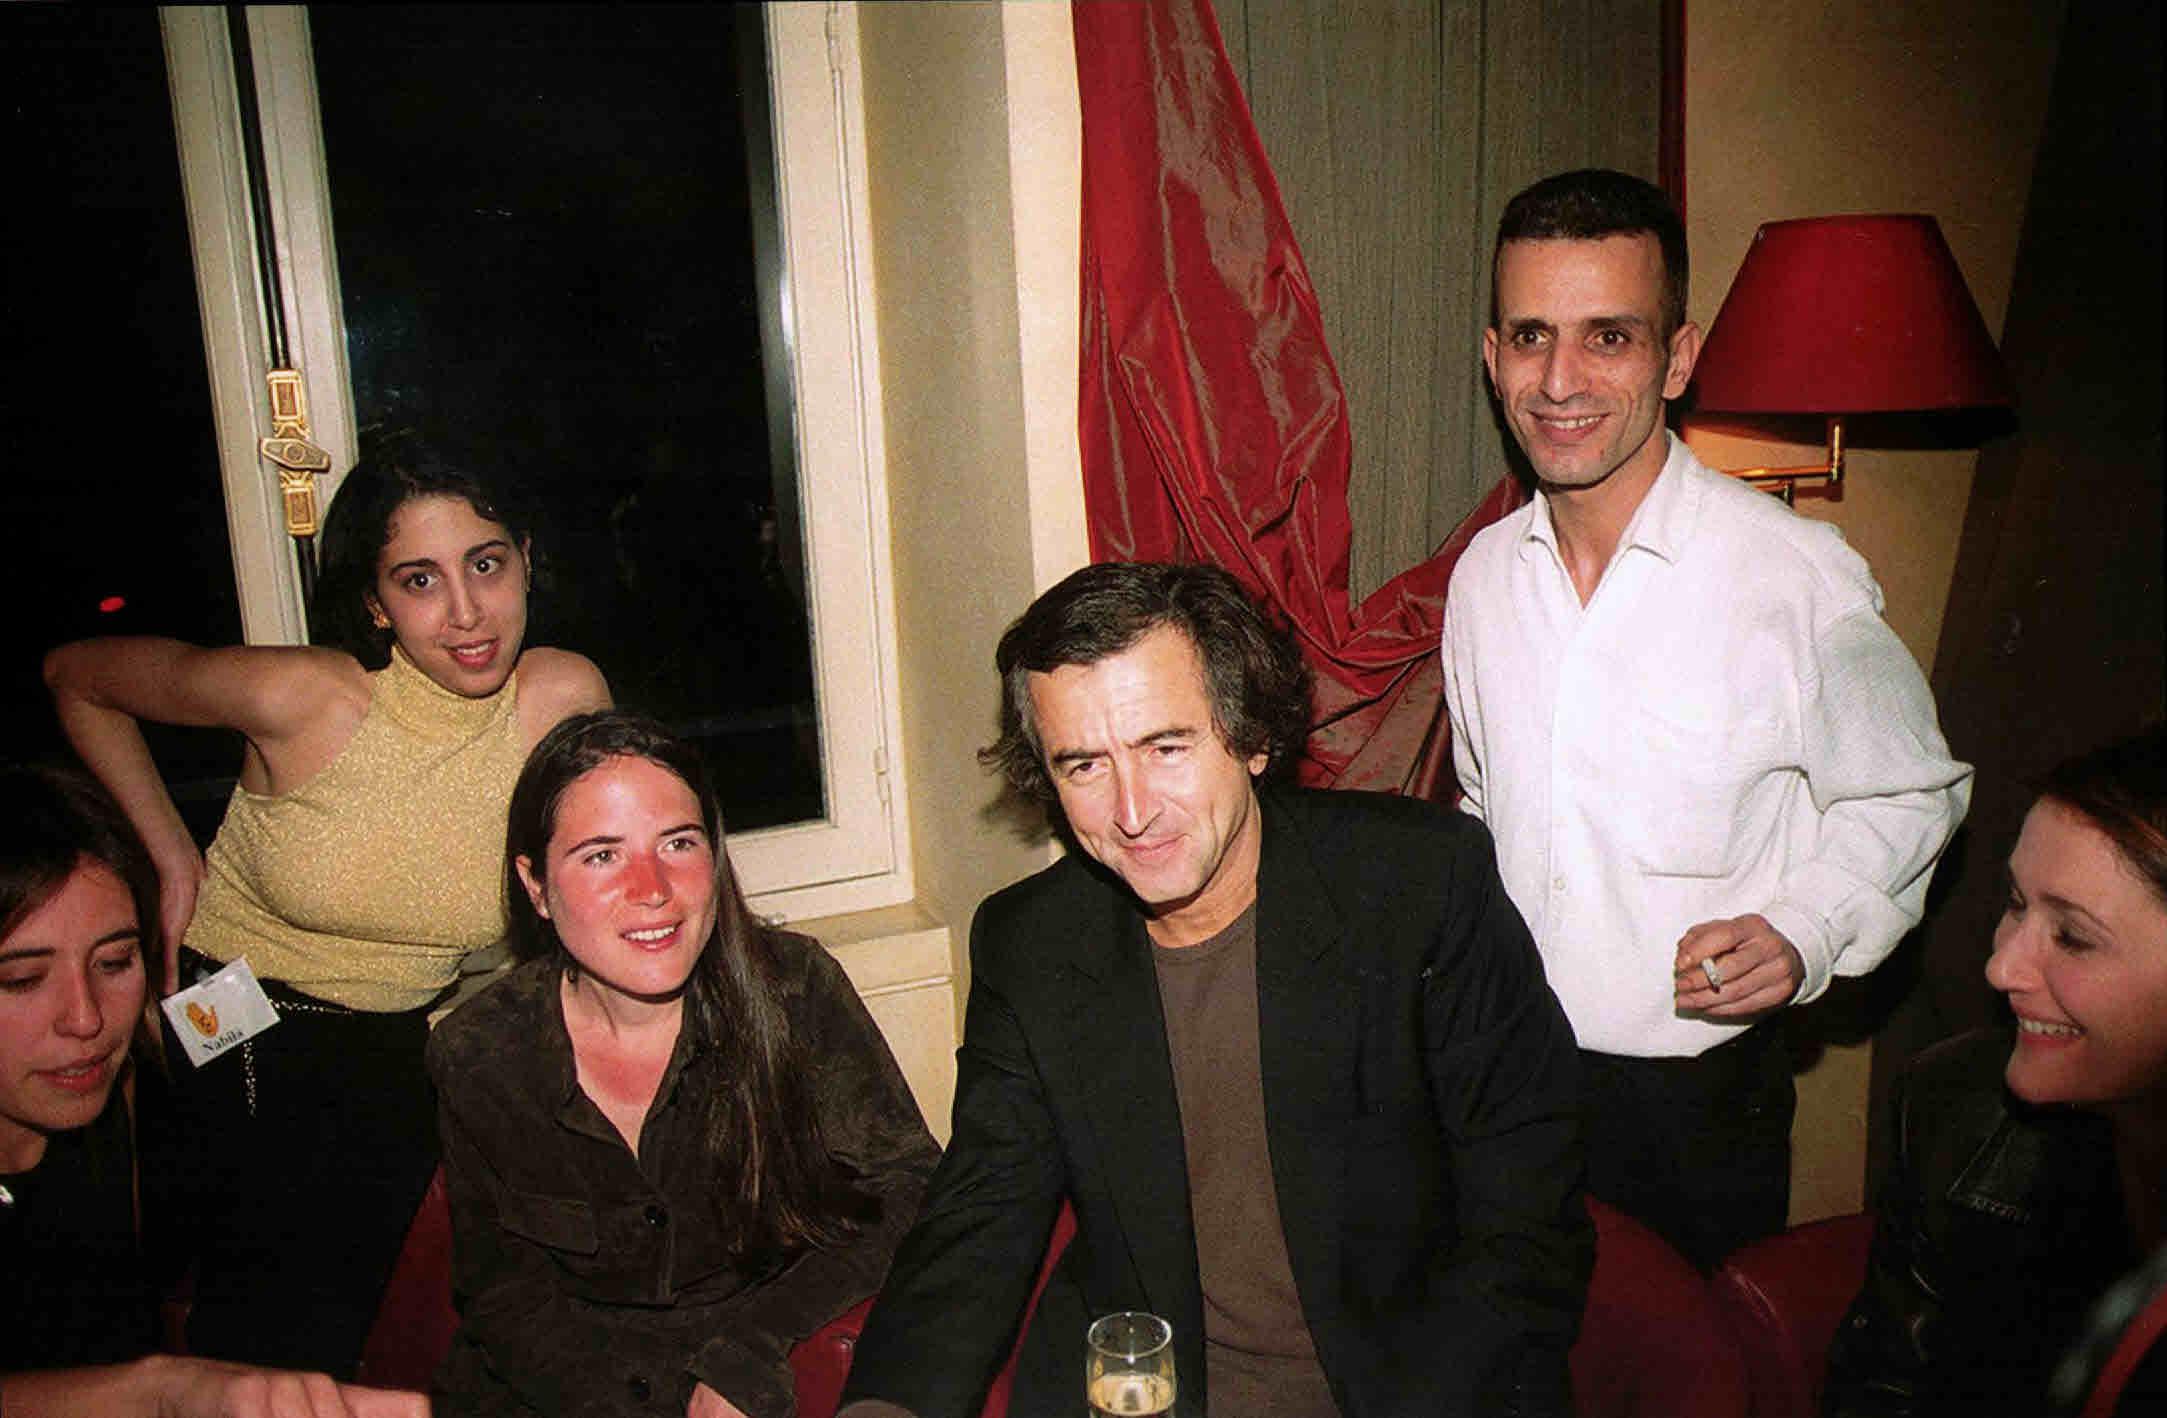 Pierre-Yves Rougeyron | Wiki Dissidence | Fandom